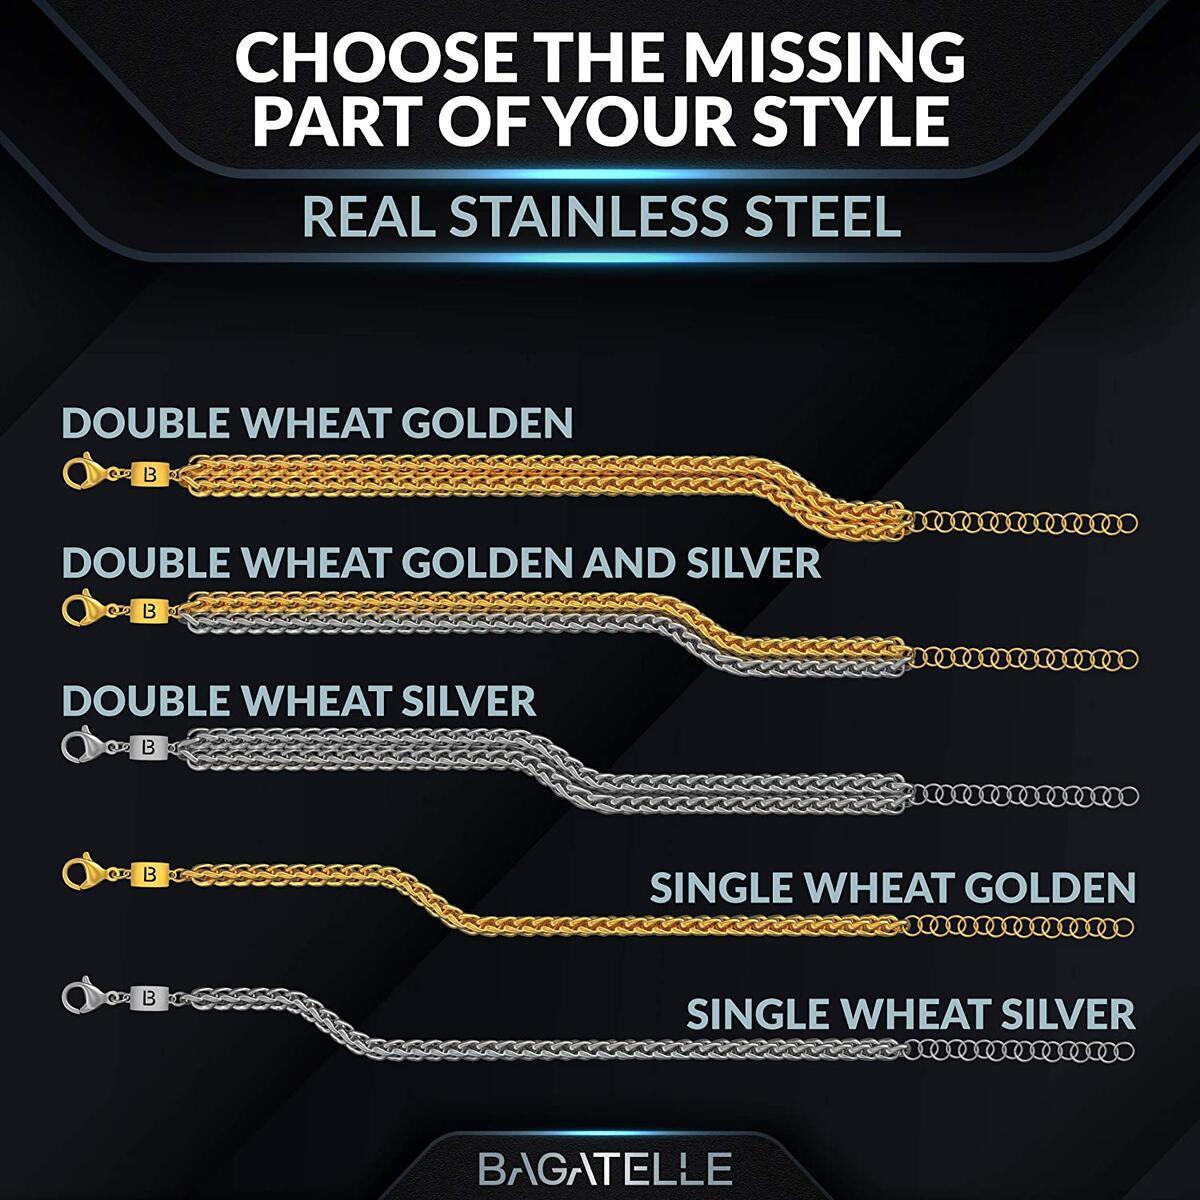 Bagatelle Handmade Luxury Stainless Steel Gold Bracelets for Men, Mens Bracelet Gold Plated Chain fits Arm Size 6.7